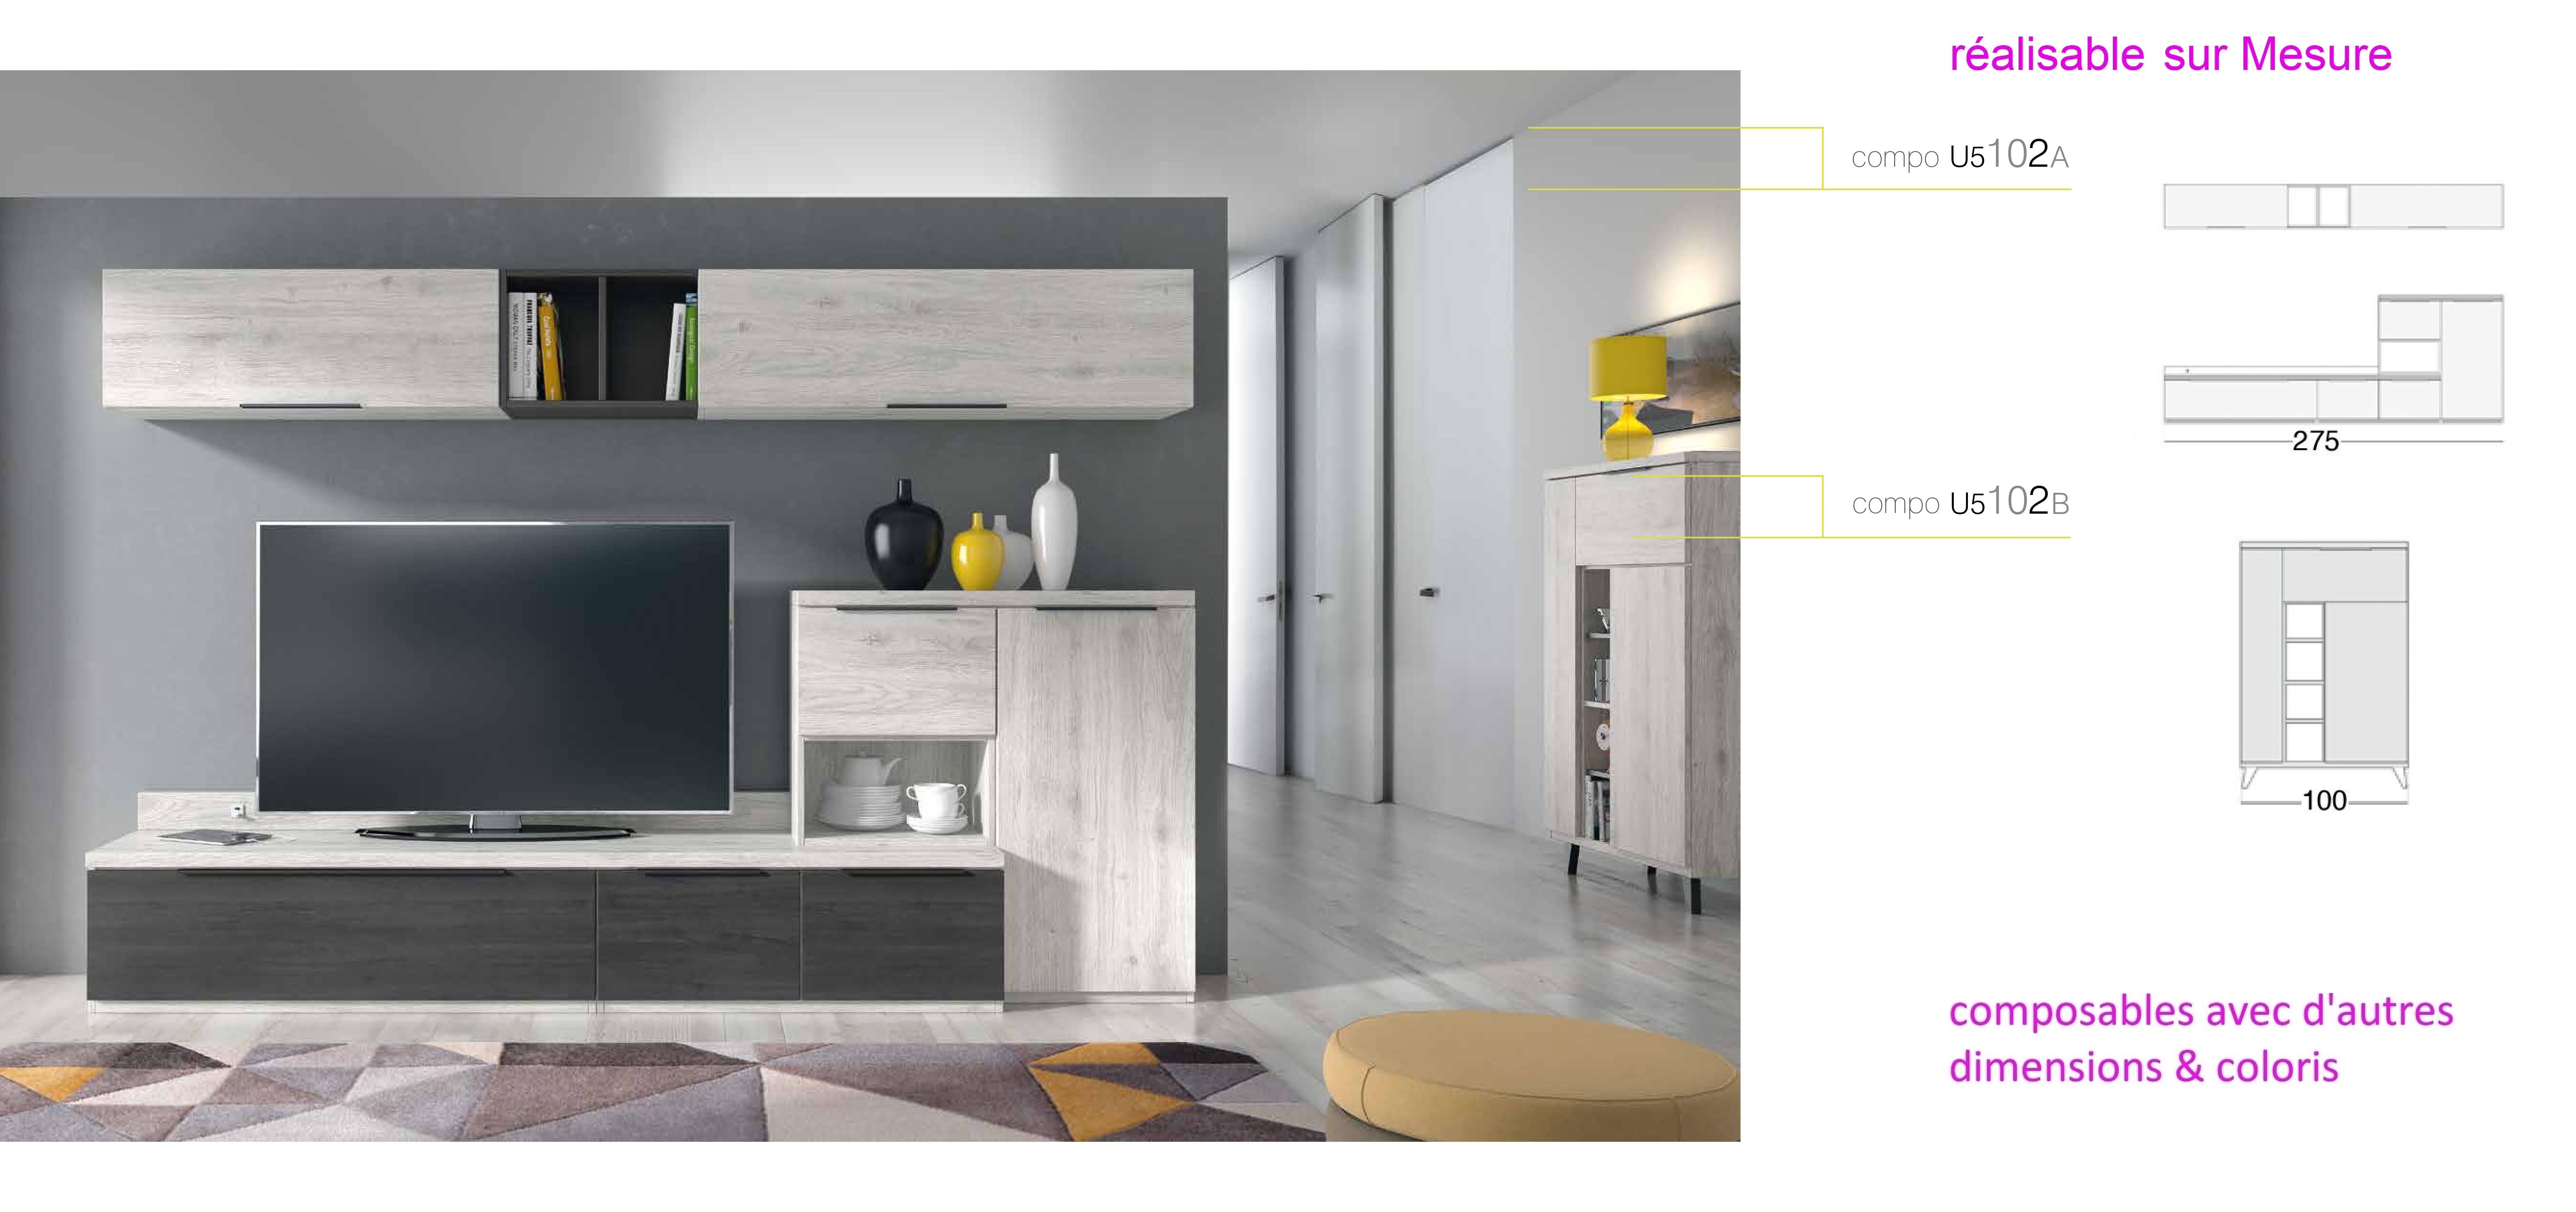 salcedo s jour salon salle manger interieur chezsoidesign st cyr sur mer. Black Bedroom Furniture Sets. Home Design Ideas